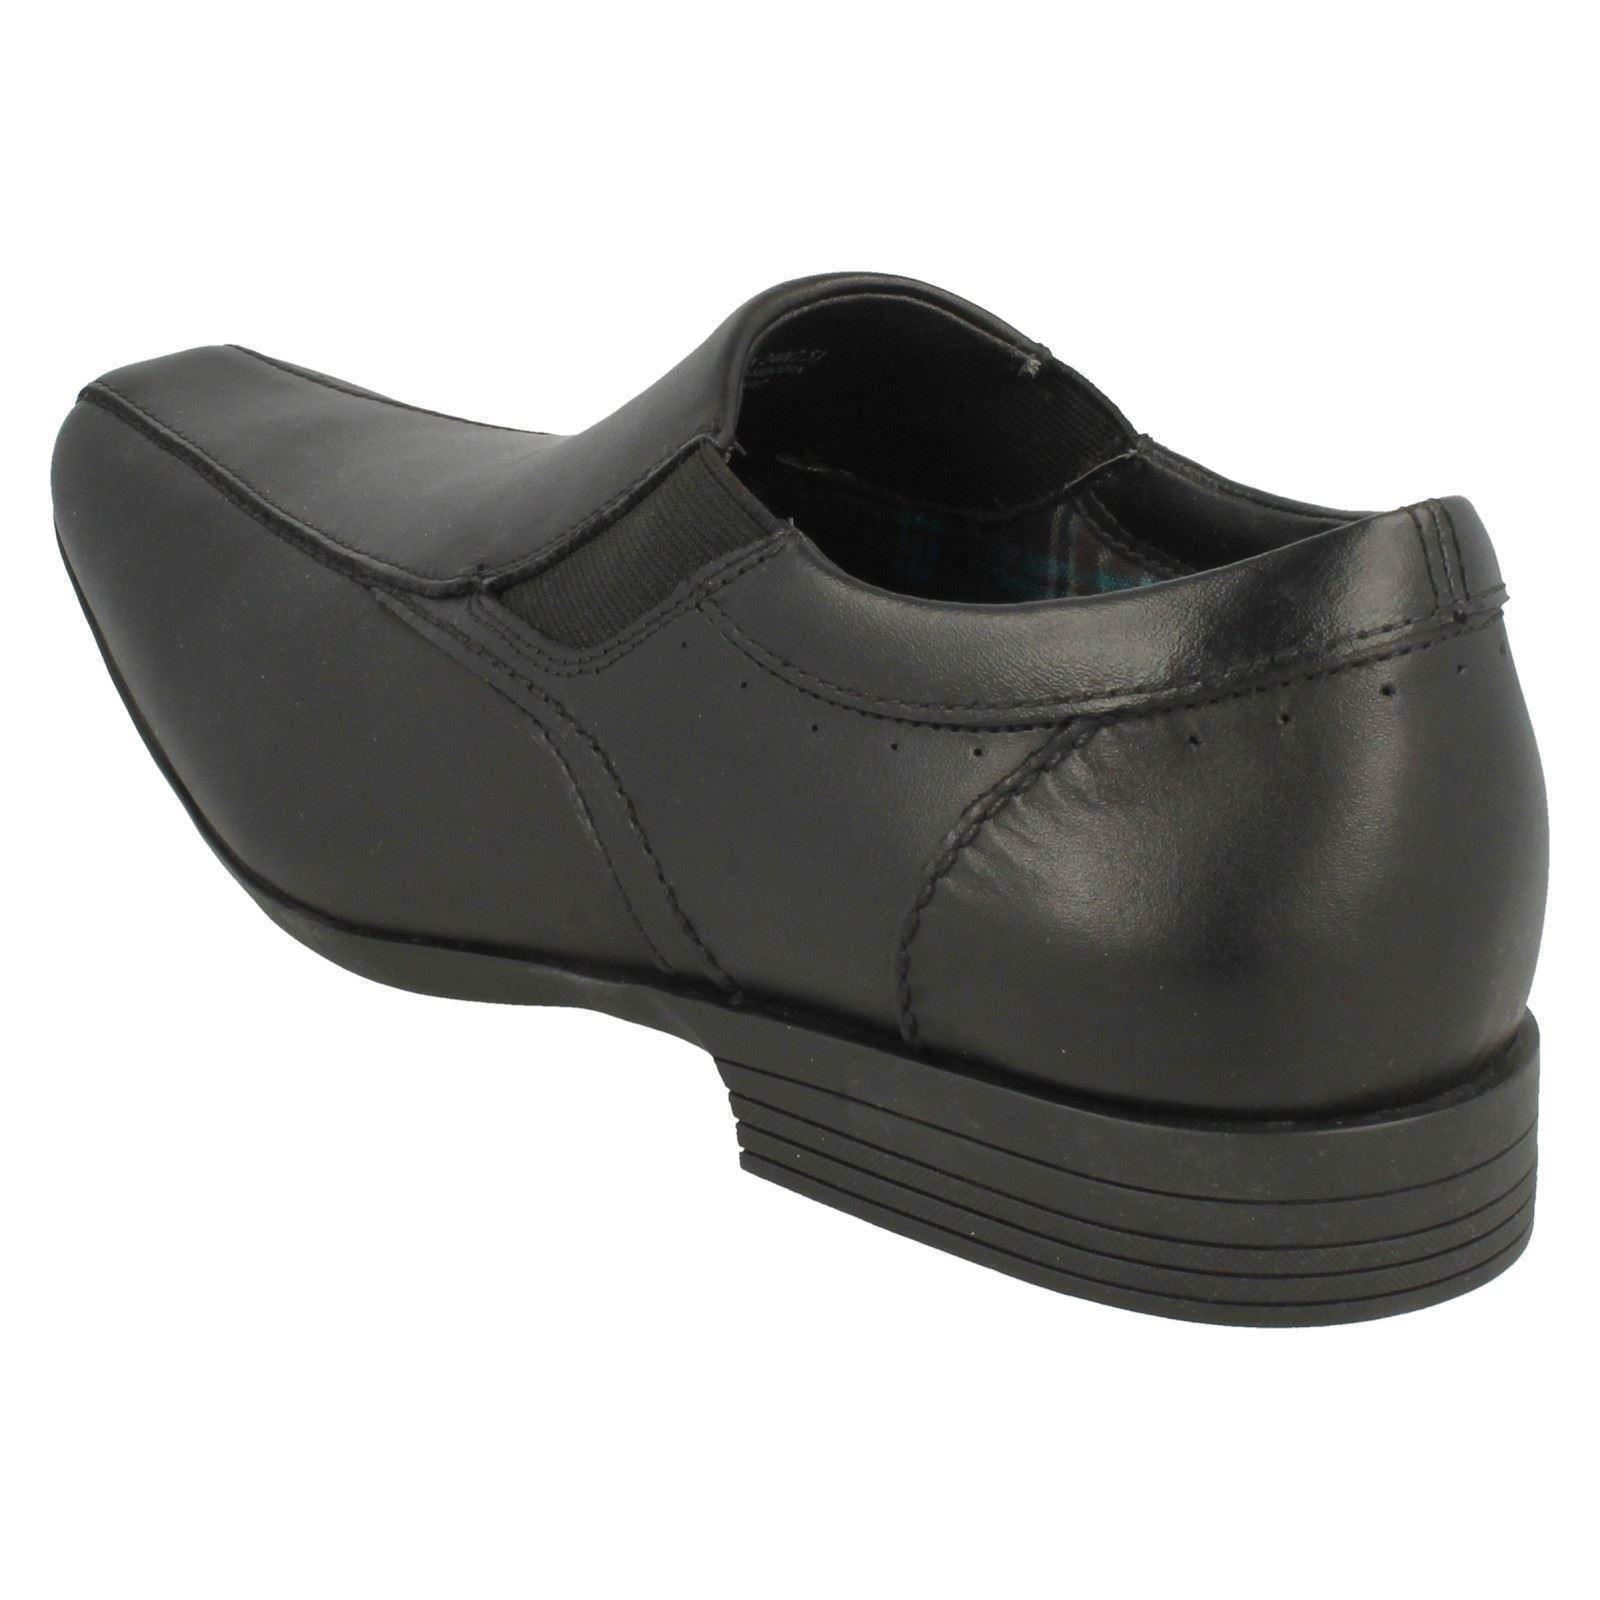 Step Hombre Cordones Zapatos Clarks Forbes Sin Vestir De 1pZwFOp7q